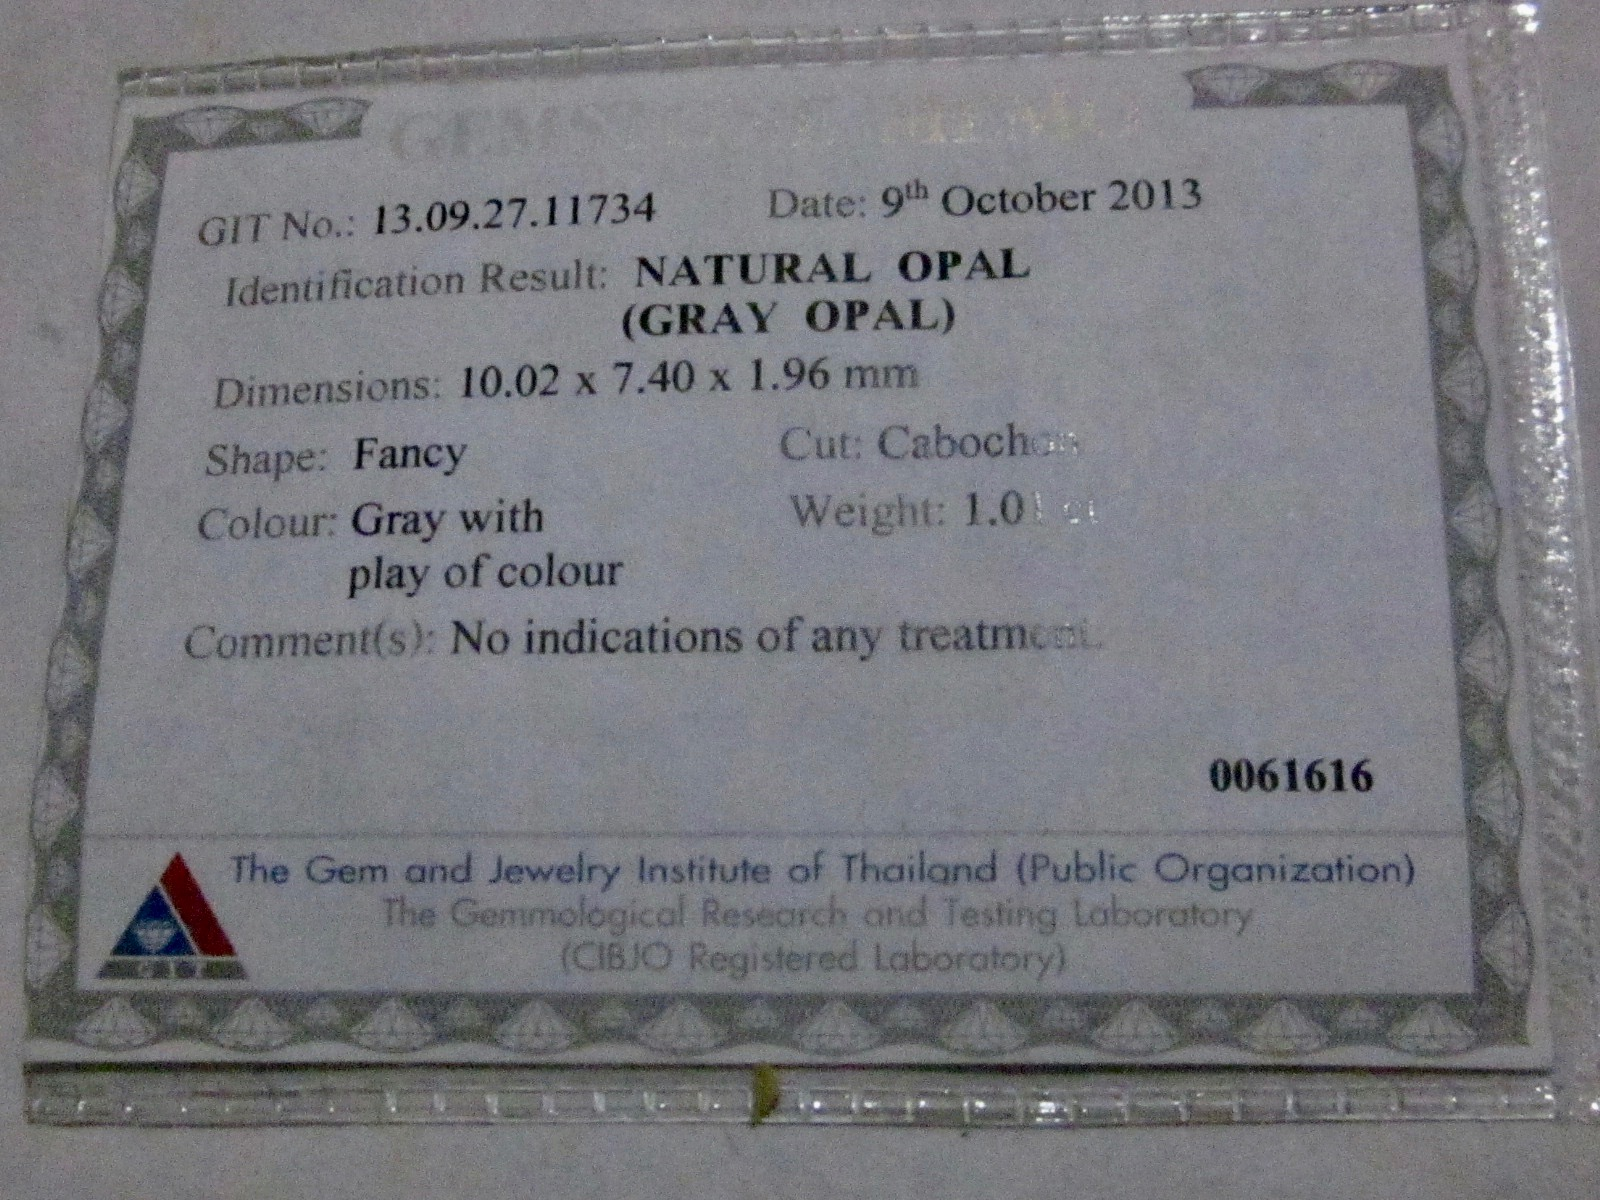 opal report, photograph opal lab report